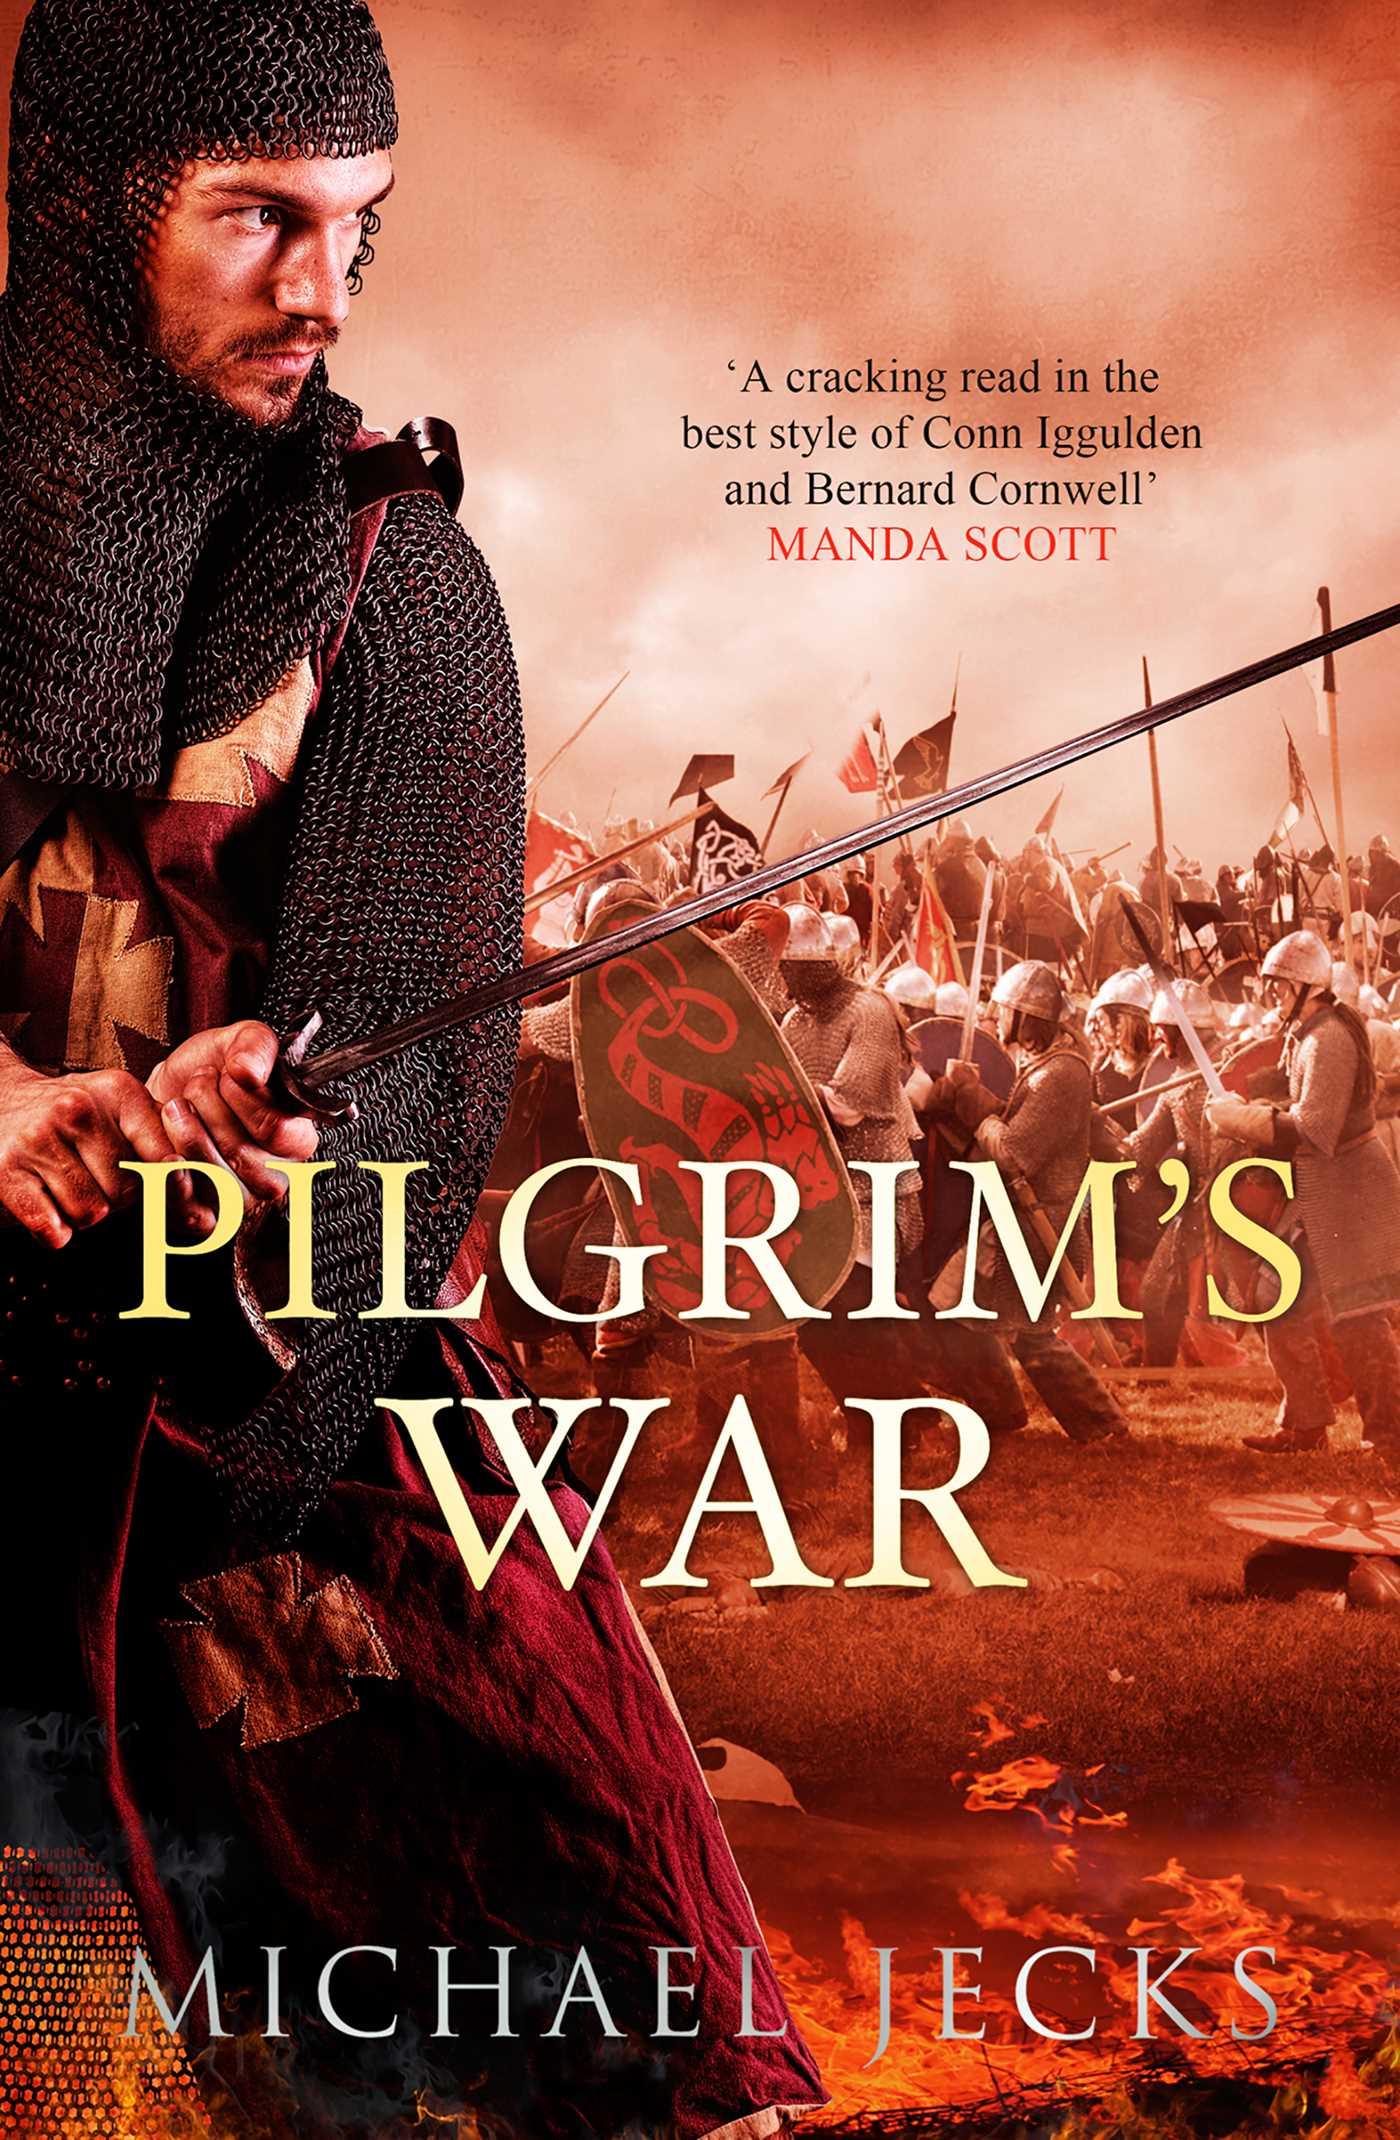 Pilgrims war 9781471150036 hr